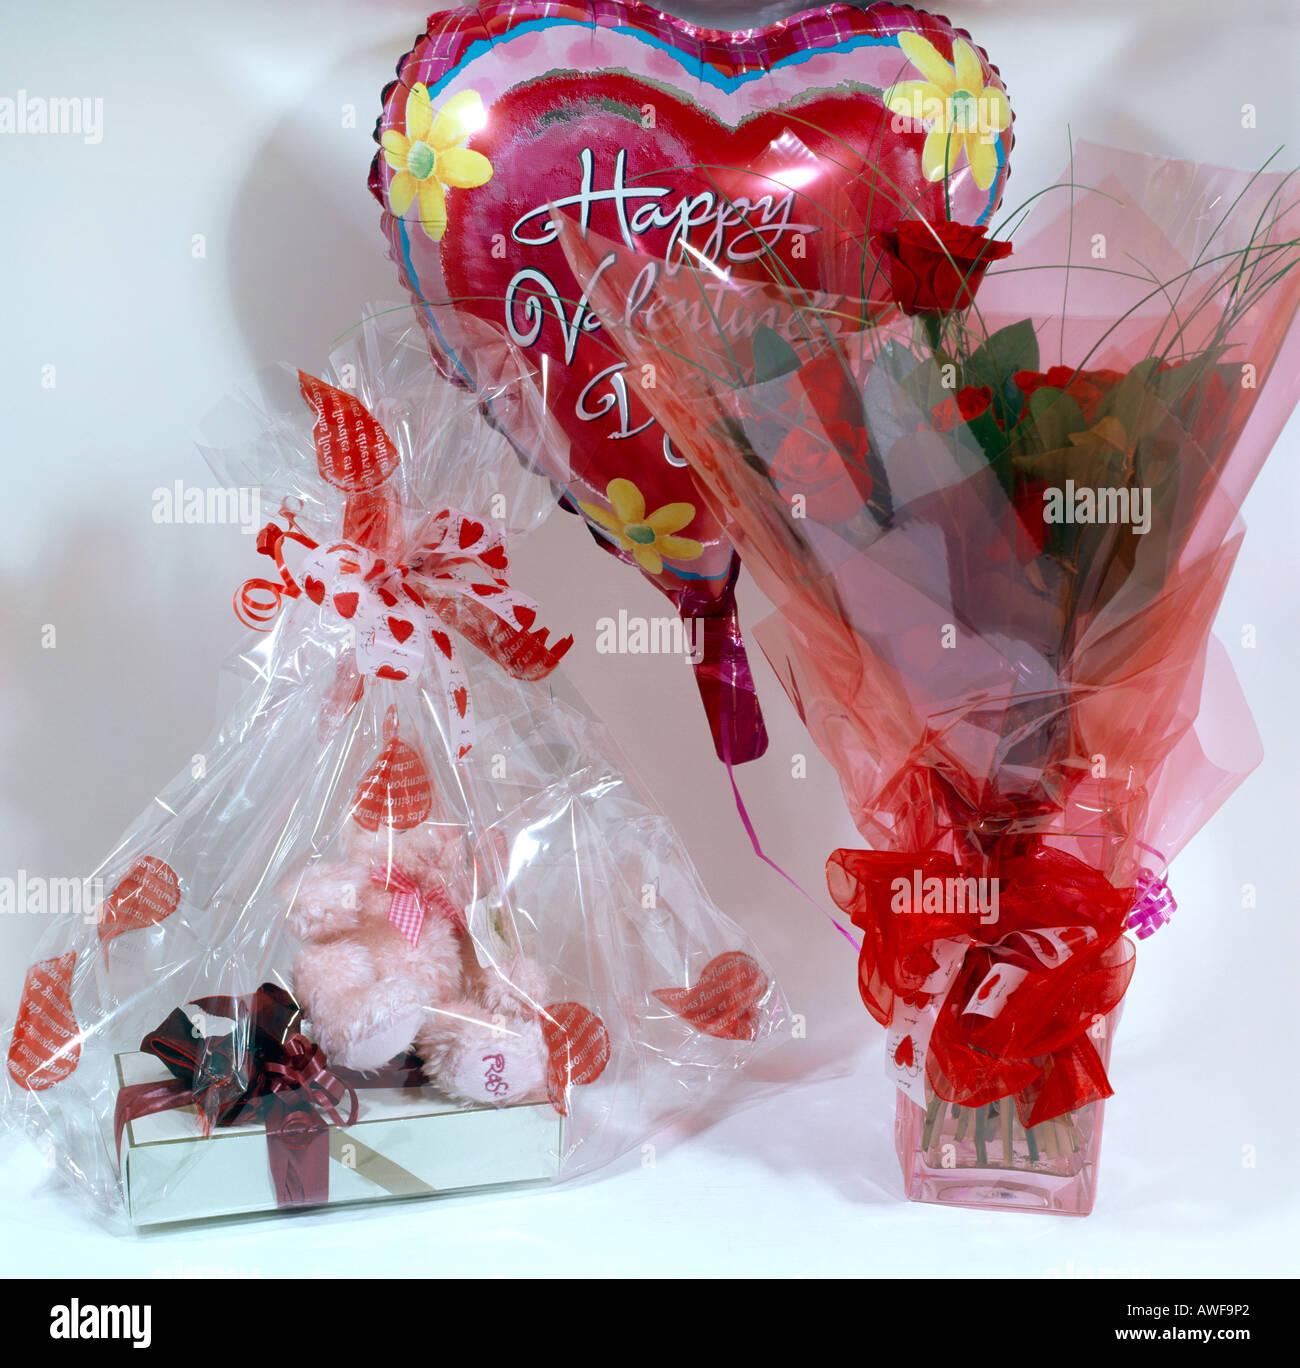 Happy Valentines Day Balloon Roses Teddy Bear Chocolates Stock